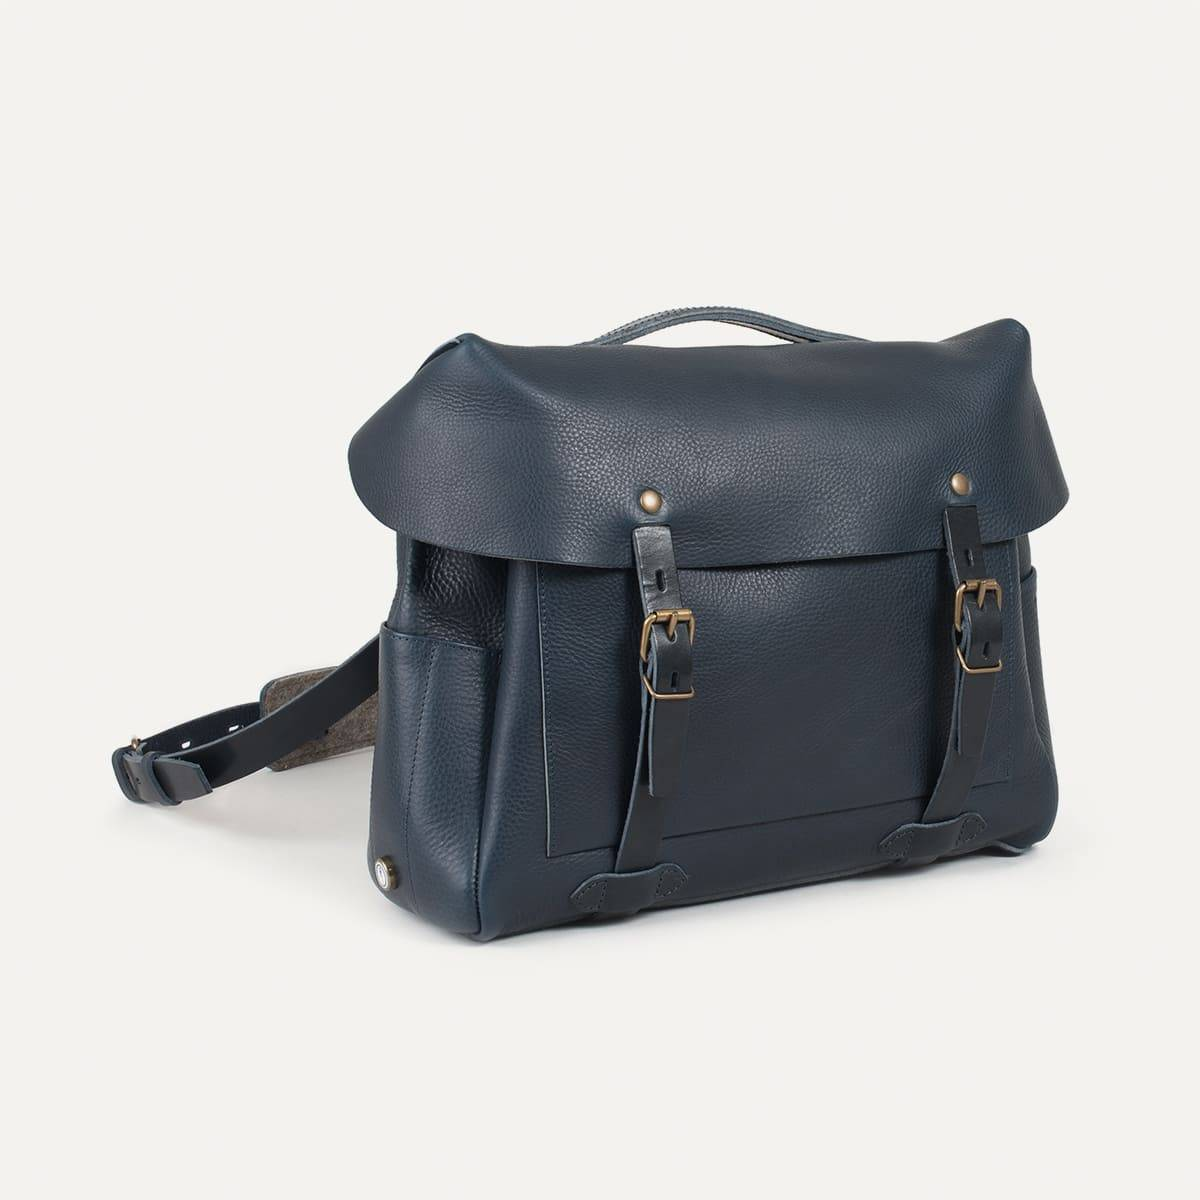 Bleu de Chauffe x Blitz Eclair bag - Navy (image n°2)